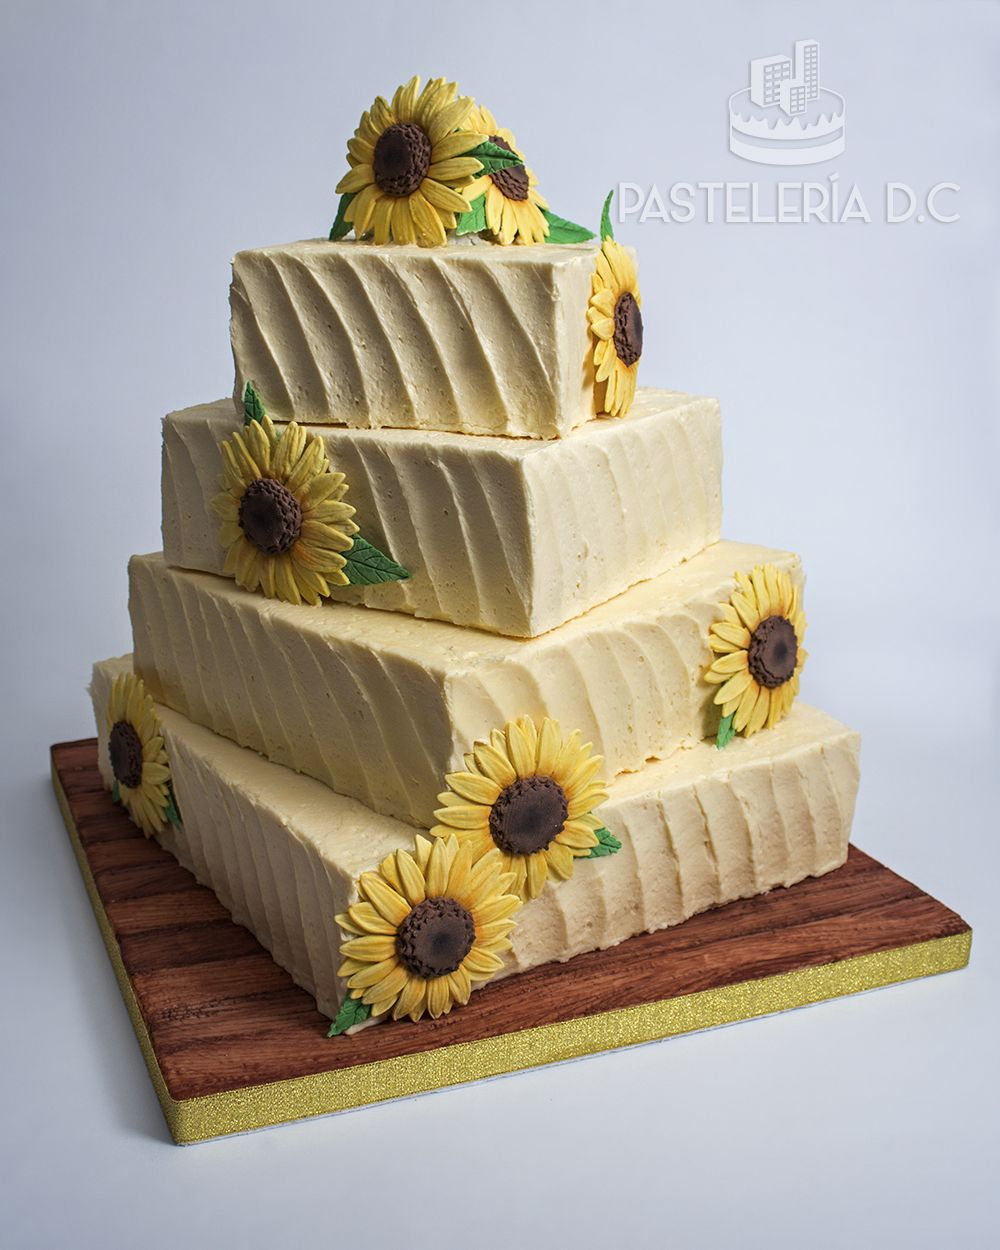 Torta Matrimonio Rustico : Torta de matrimonio rústica cubierta con buttercream y